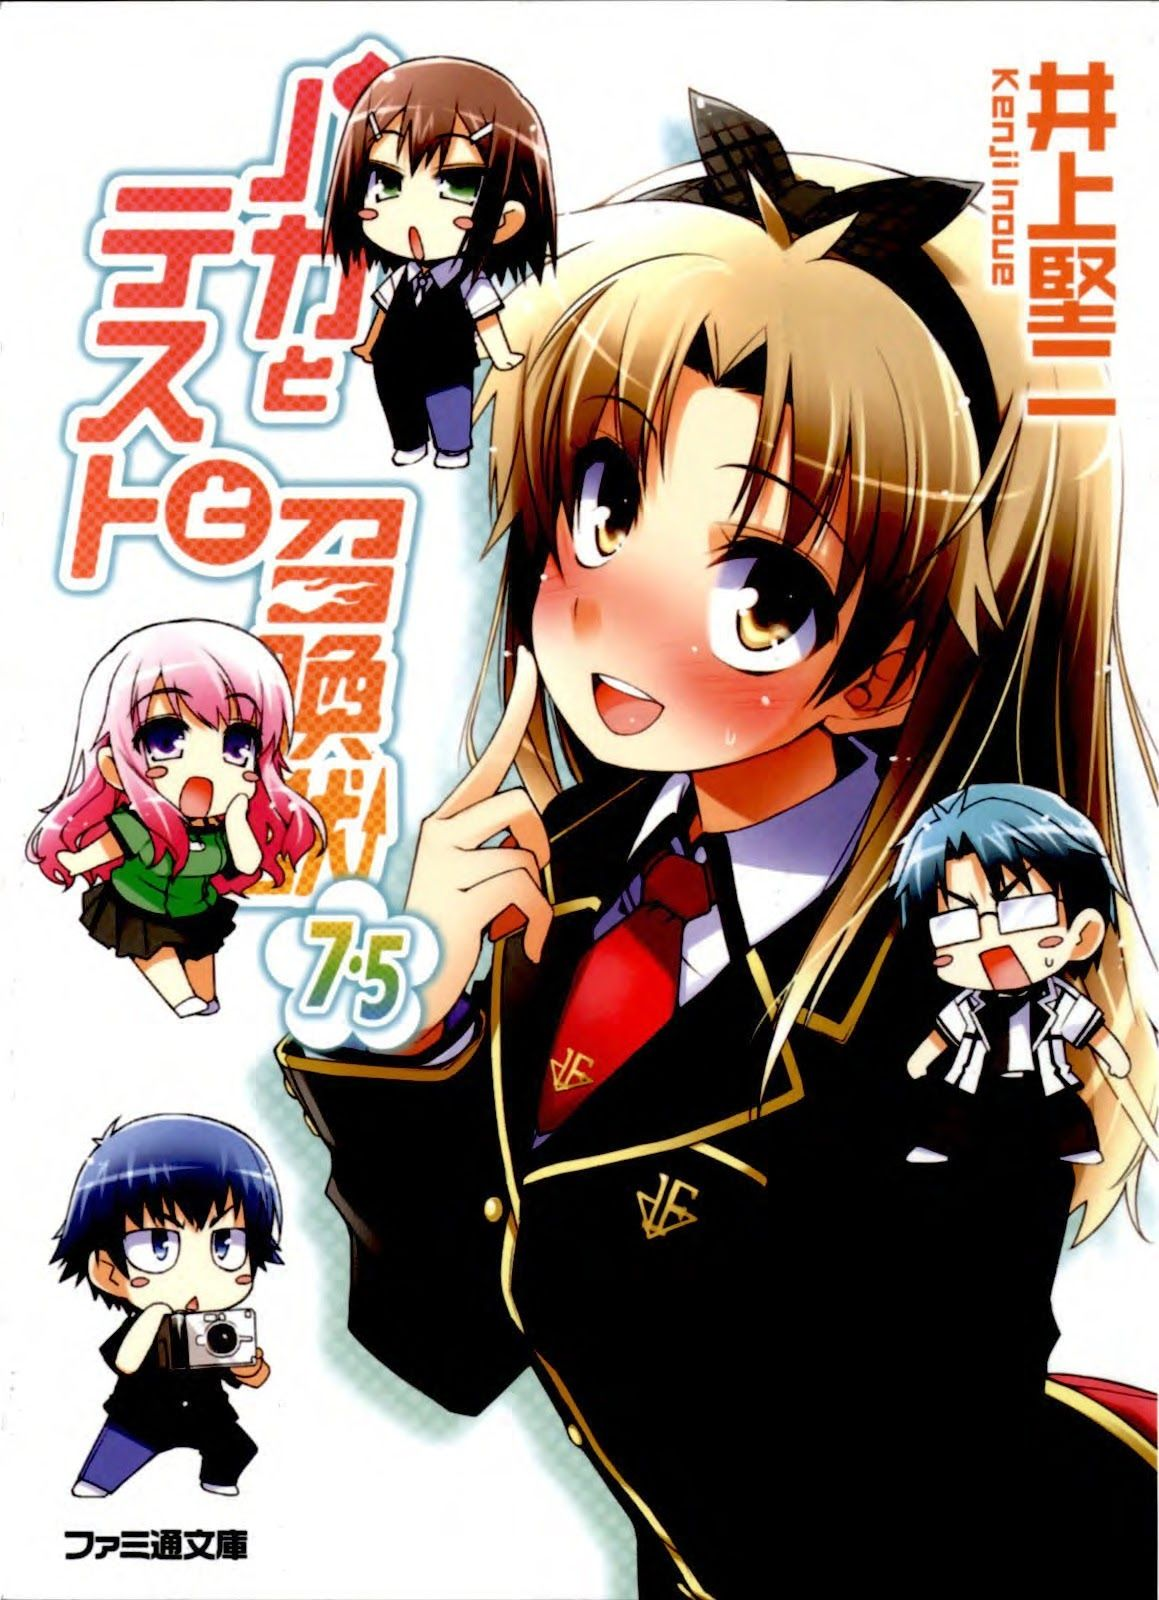 Epingle Sur Anime Game Manga Pictures I